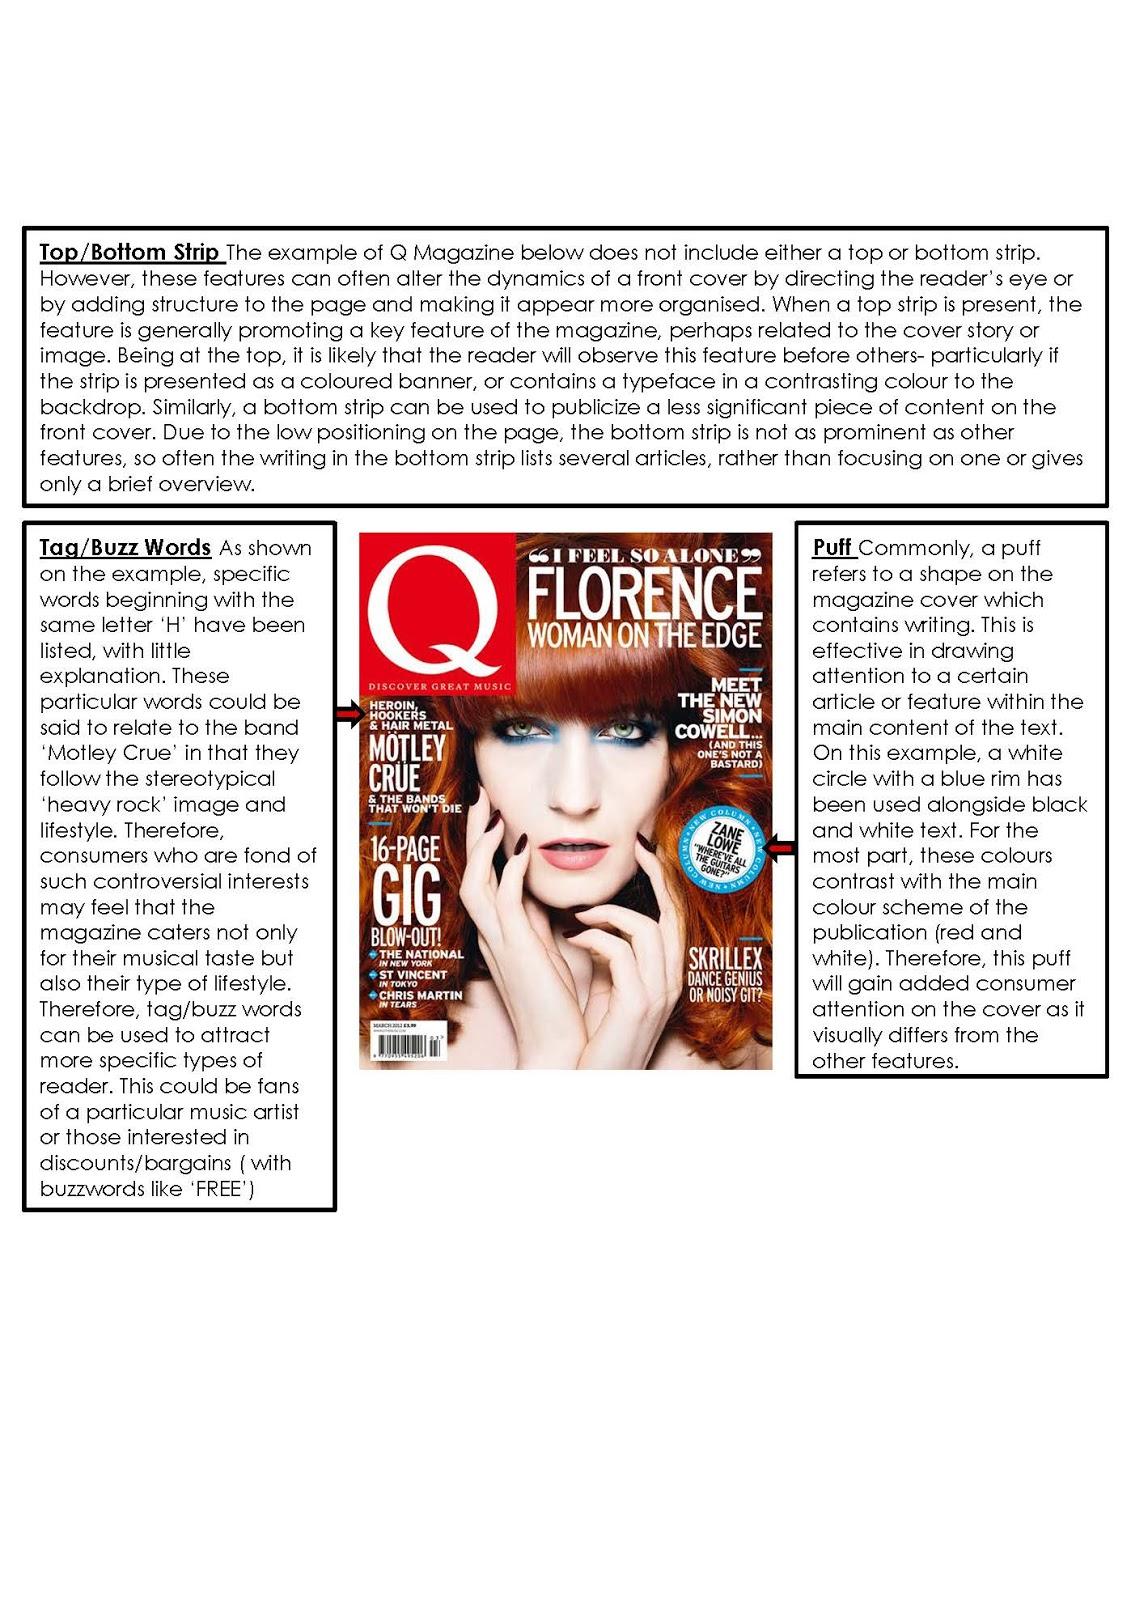 Anatomy of a Magazine Cover | AS Media Blog